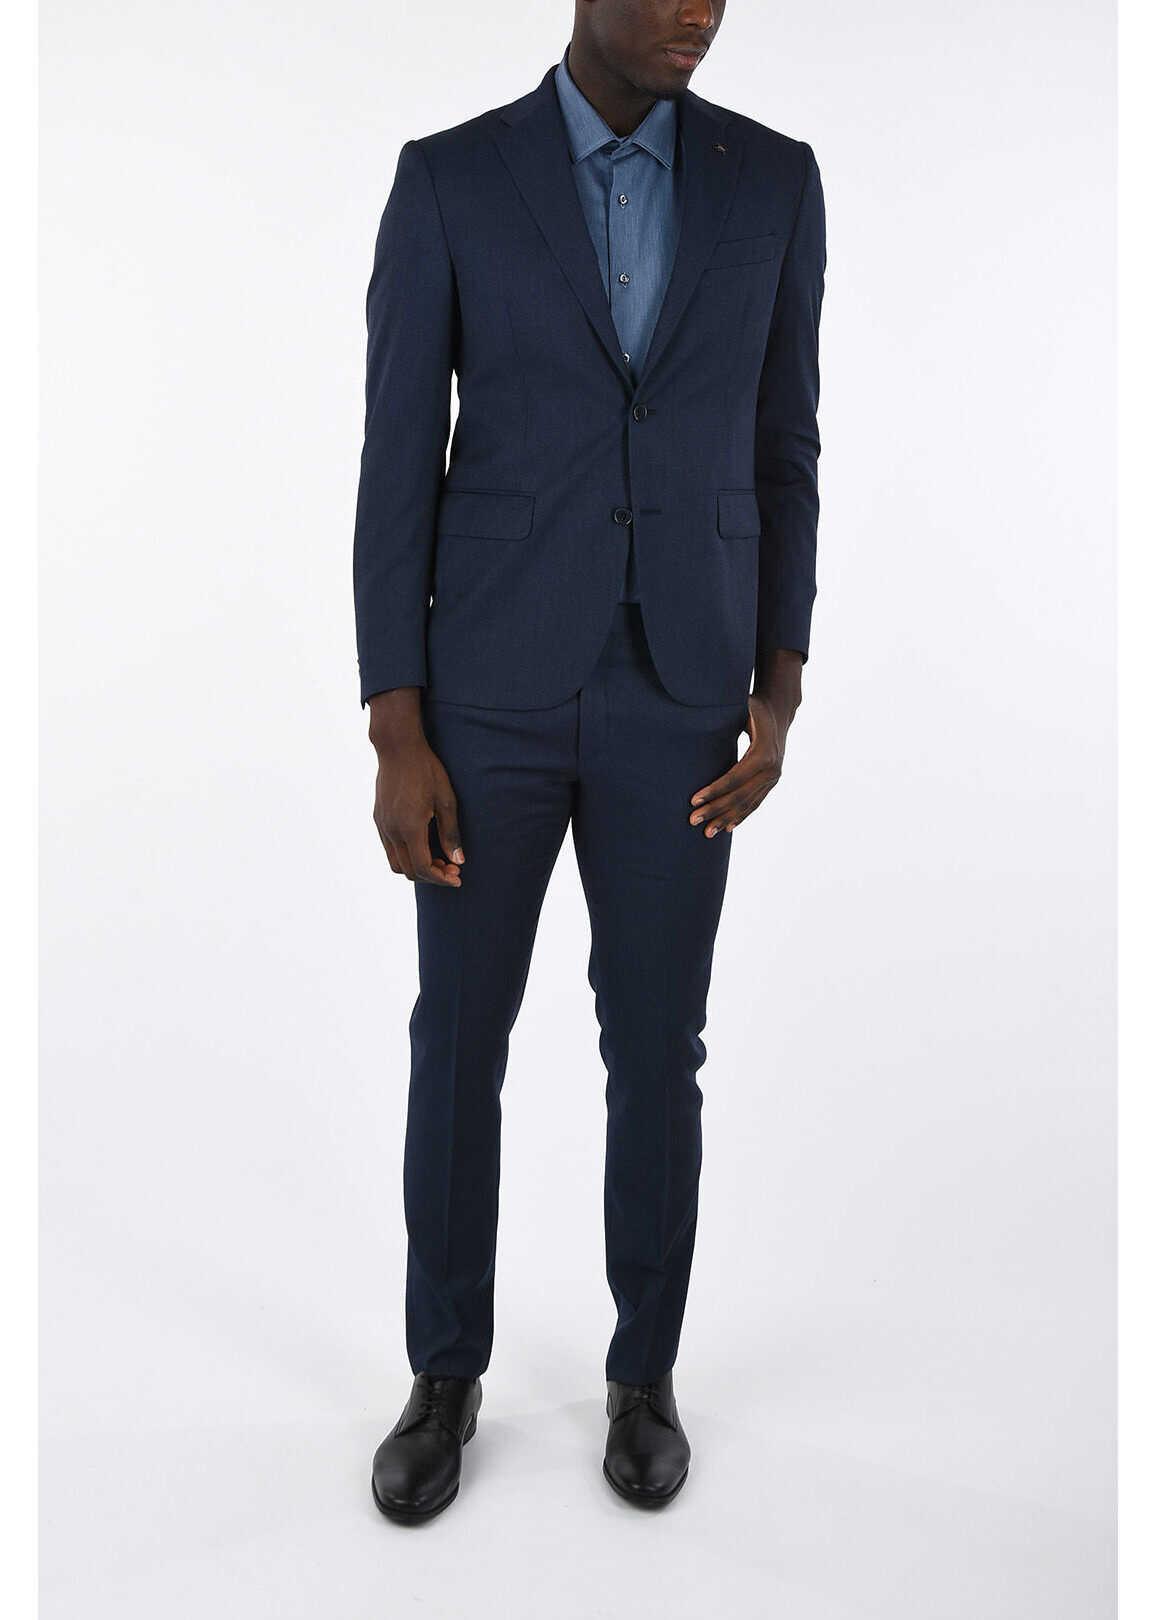 CORNELIANI CC COLLECTION pin check drop 7 R 2-button suit MIDNIGHT BLUE imagine